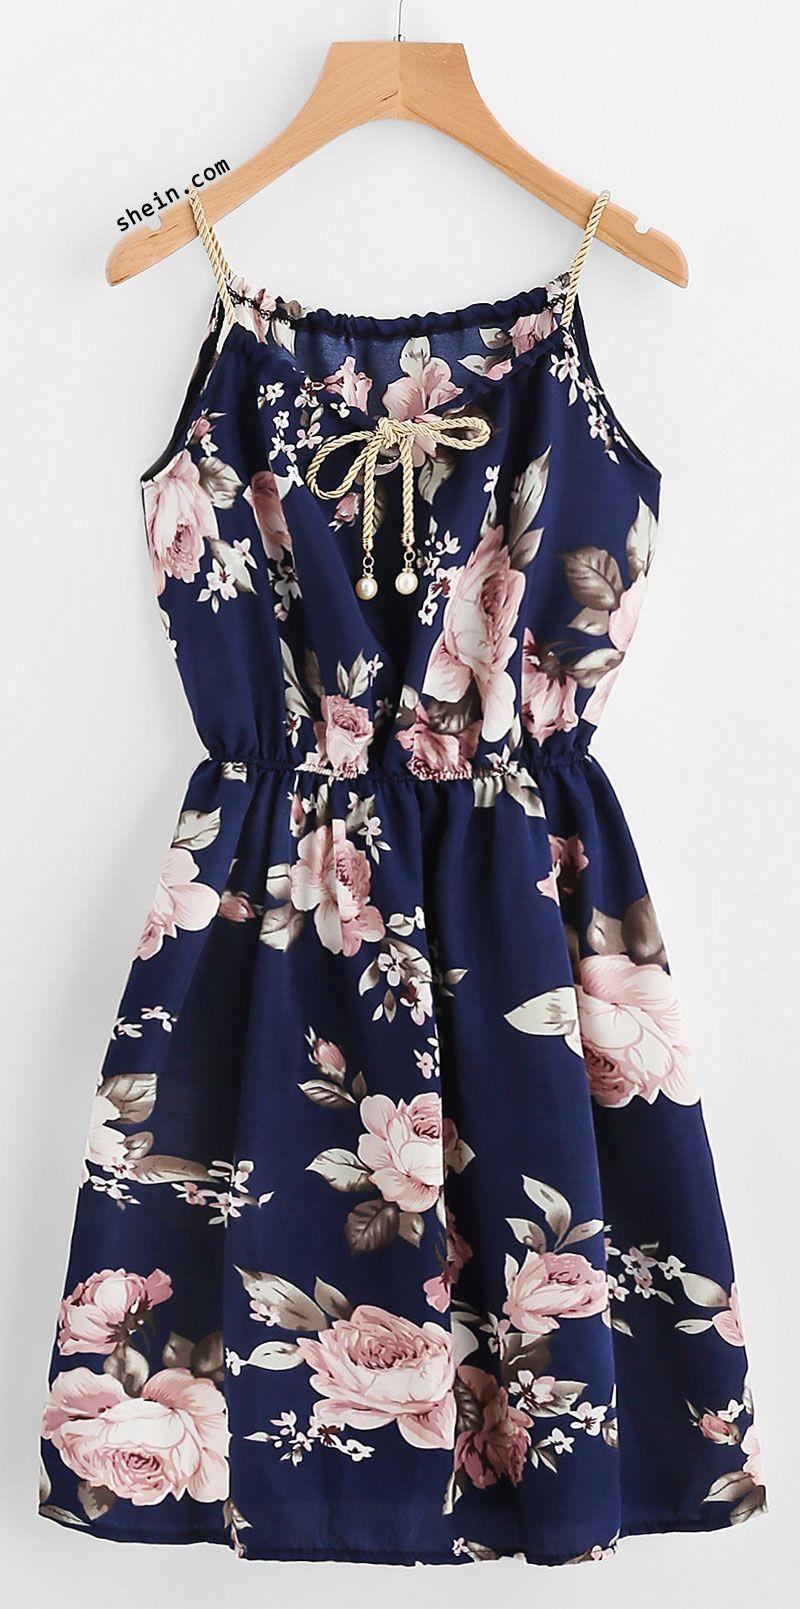 8ccca2b3122d1 Braided Bead Strap Tie Front Flower Print Dress